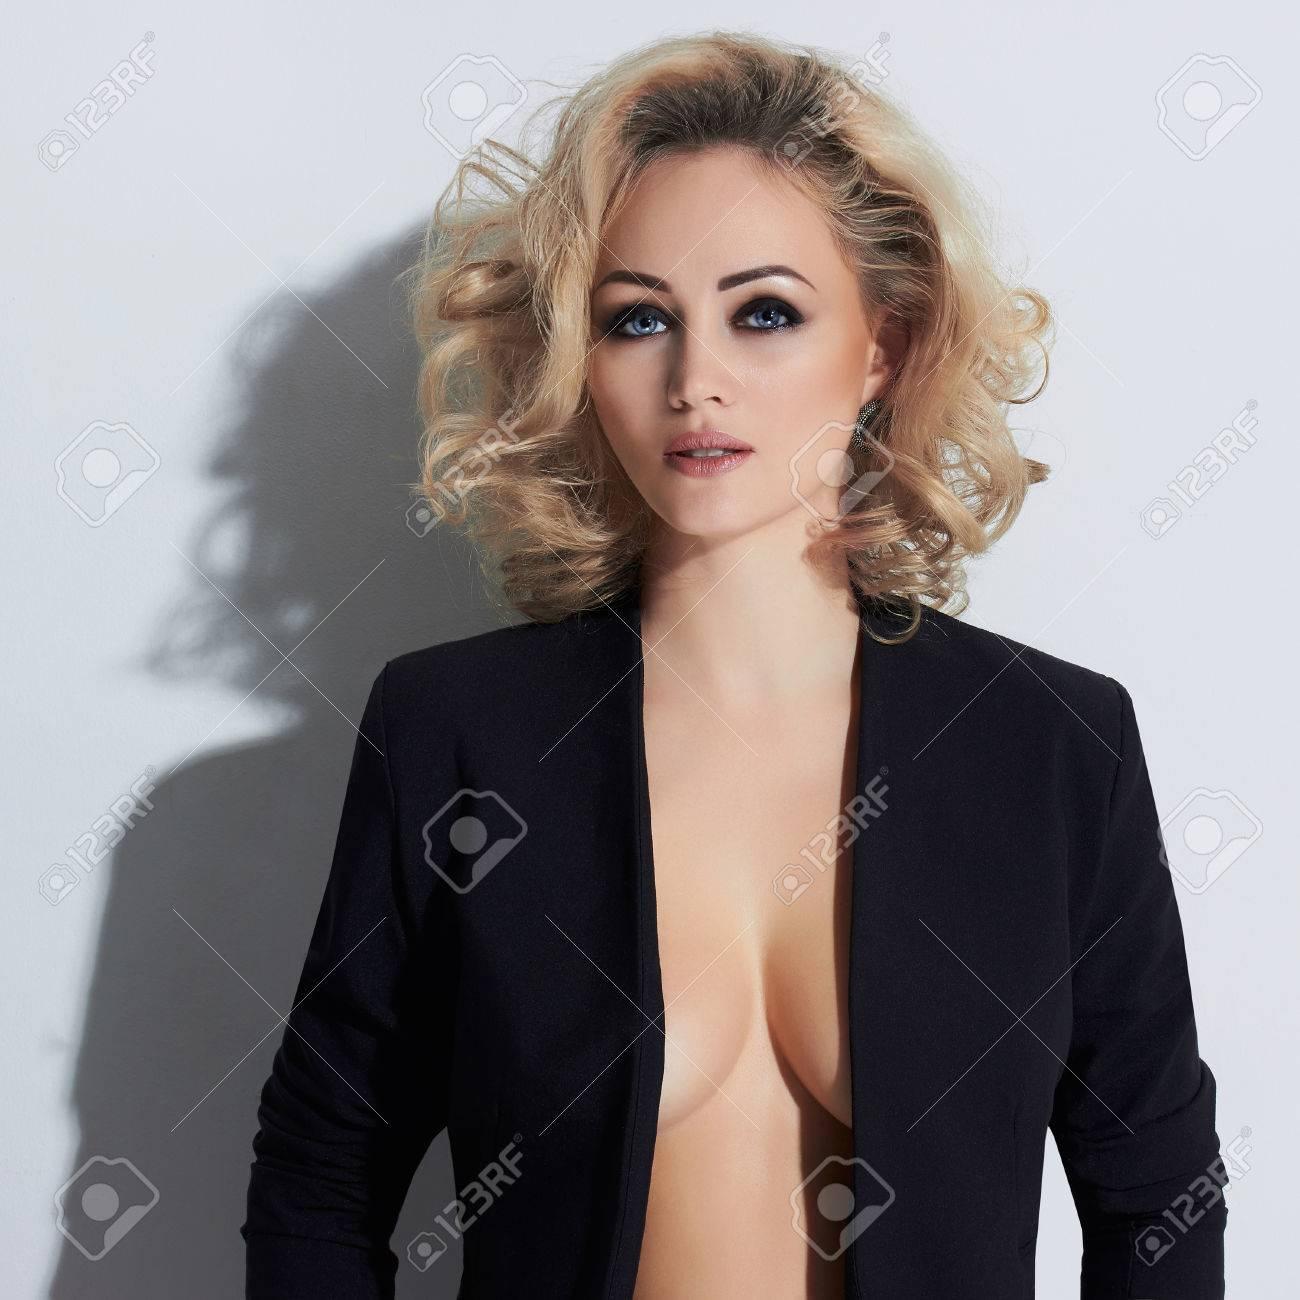 Mahema chudery nude pictures